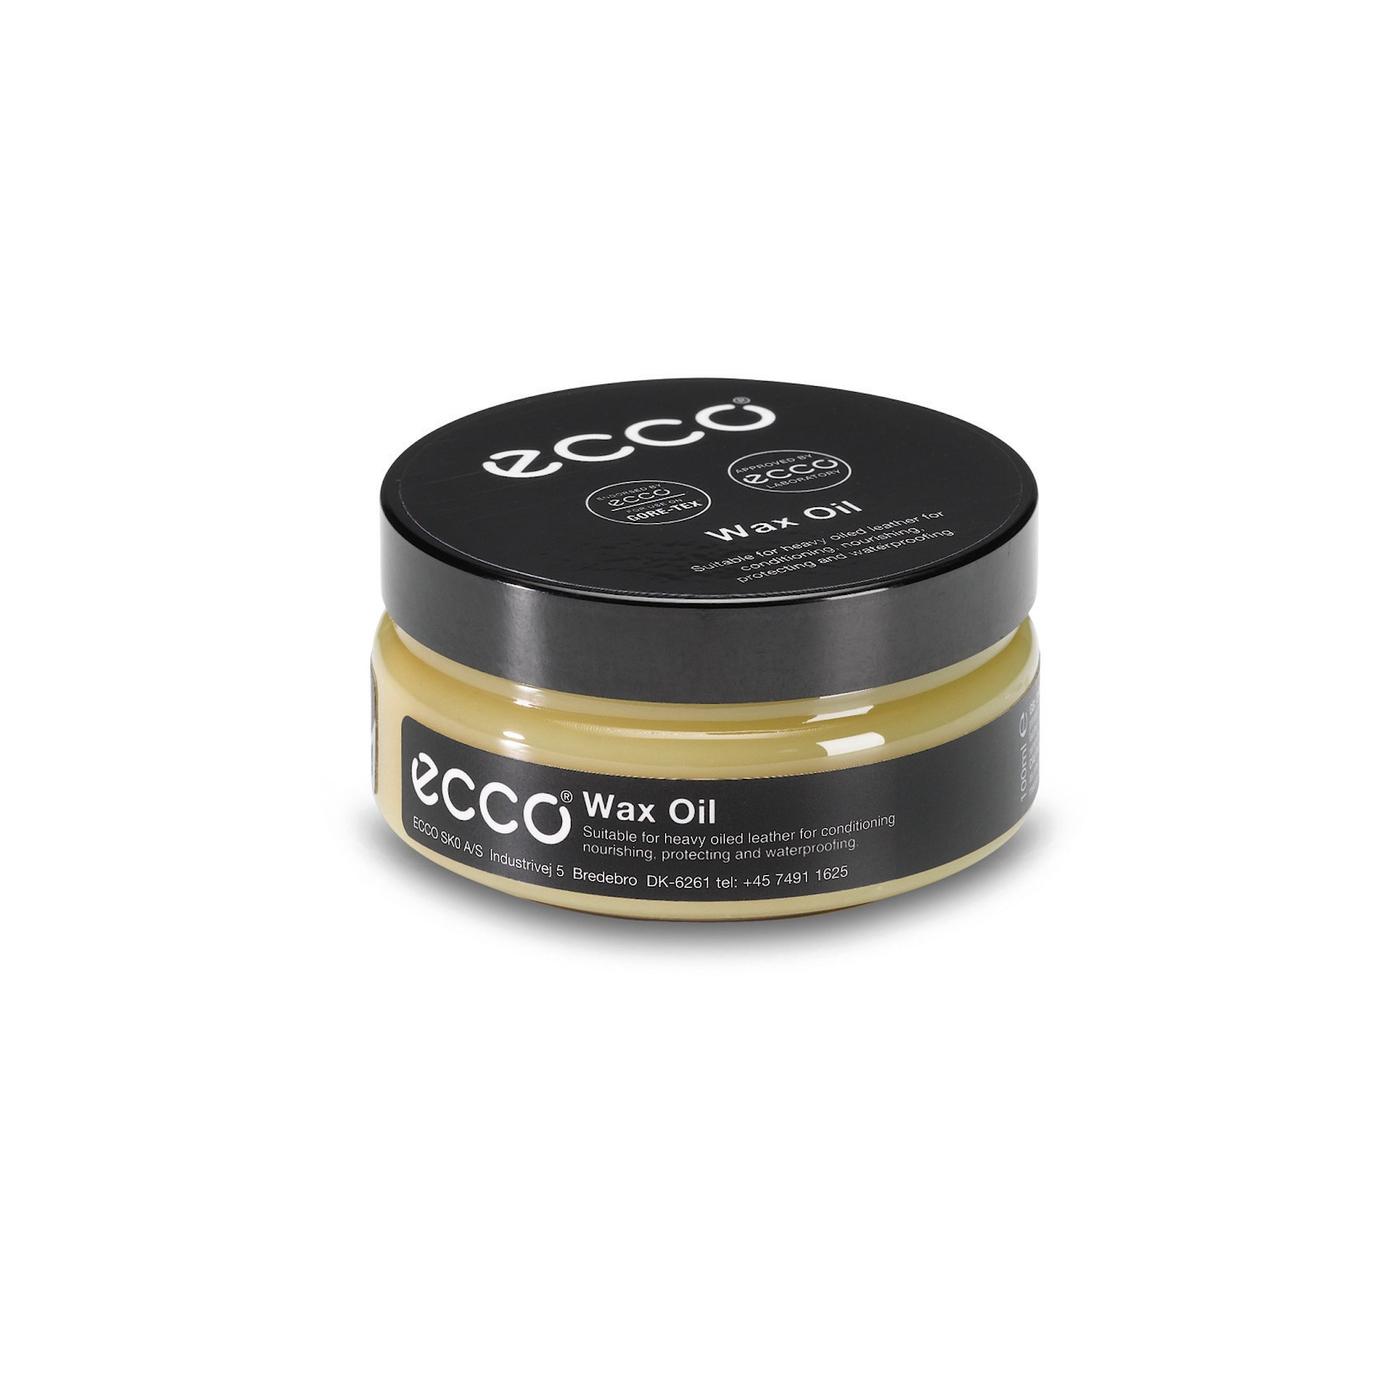 ECCO Wax Oil